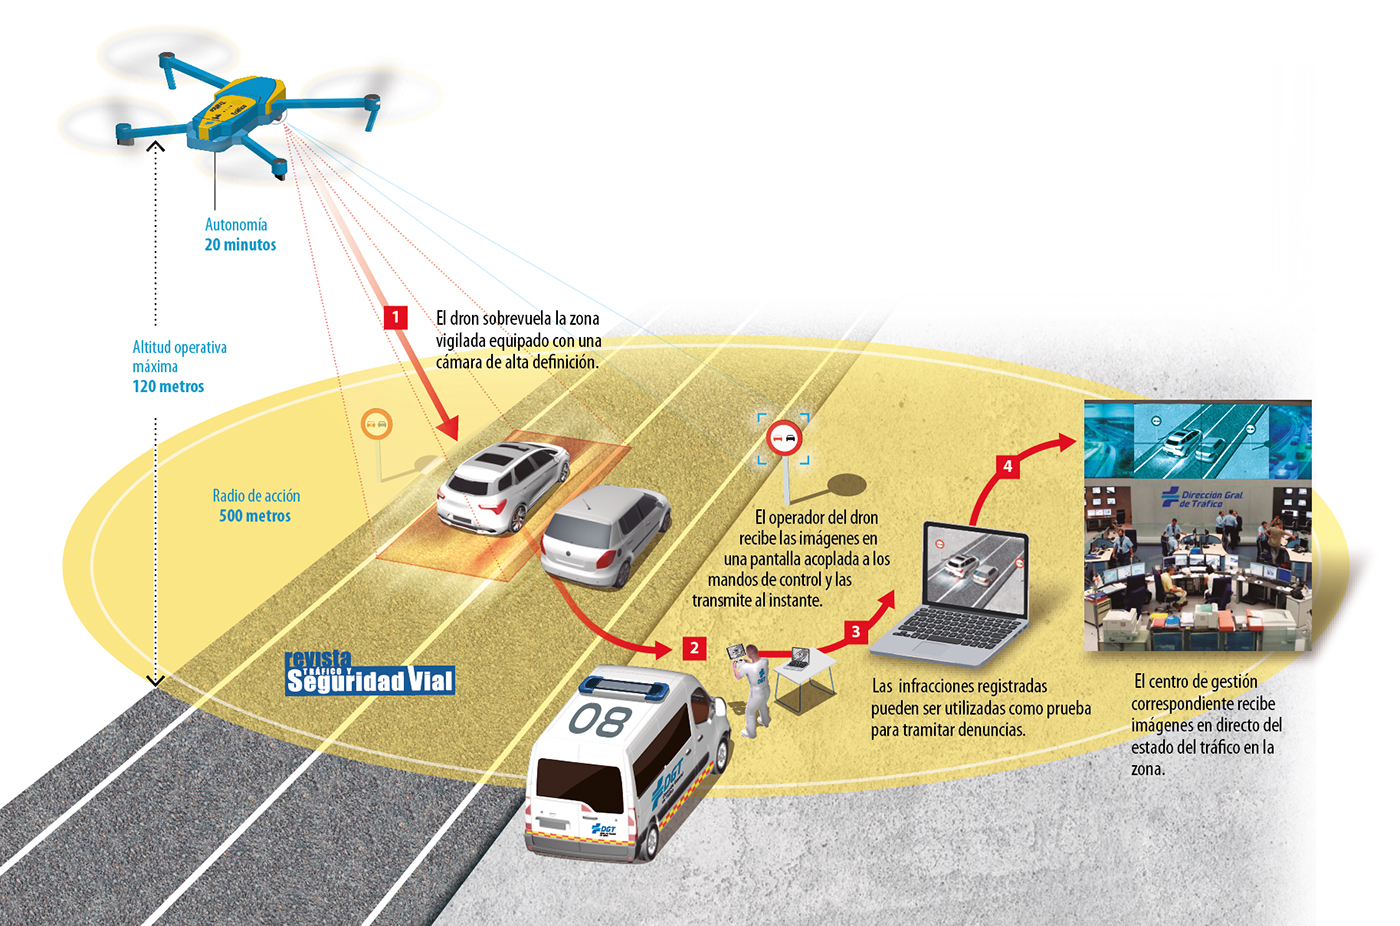 drones-info-ampliada.jpg